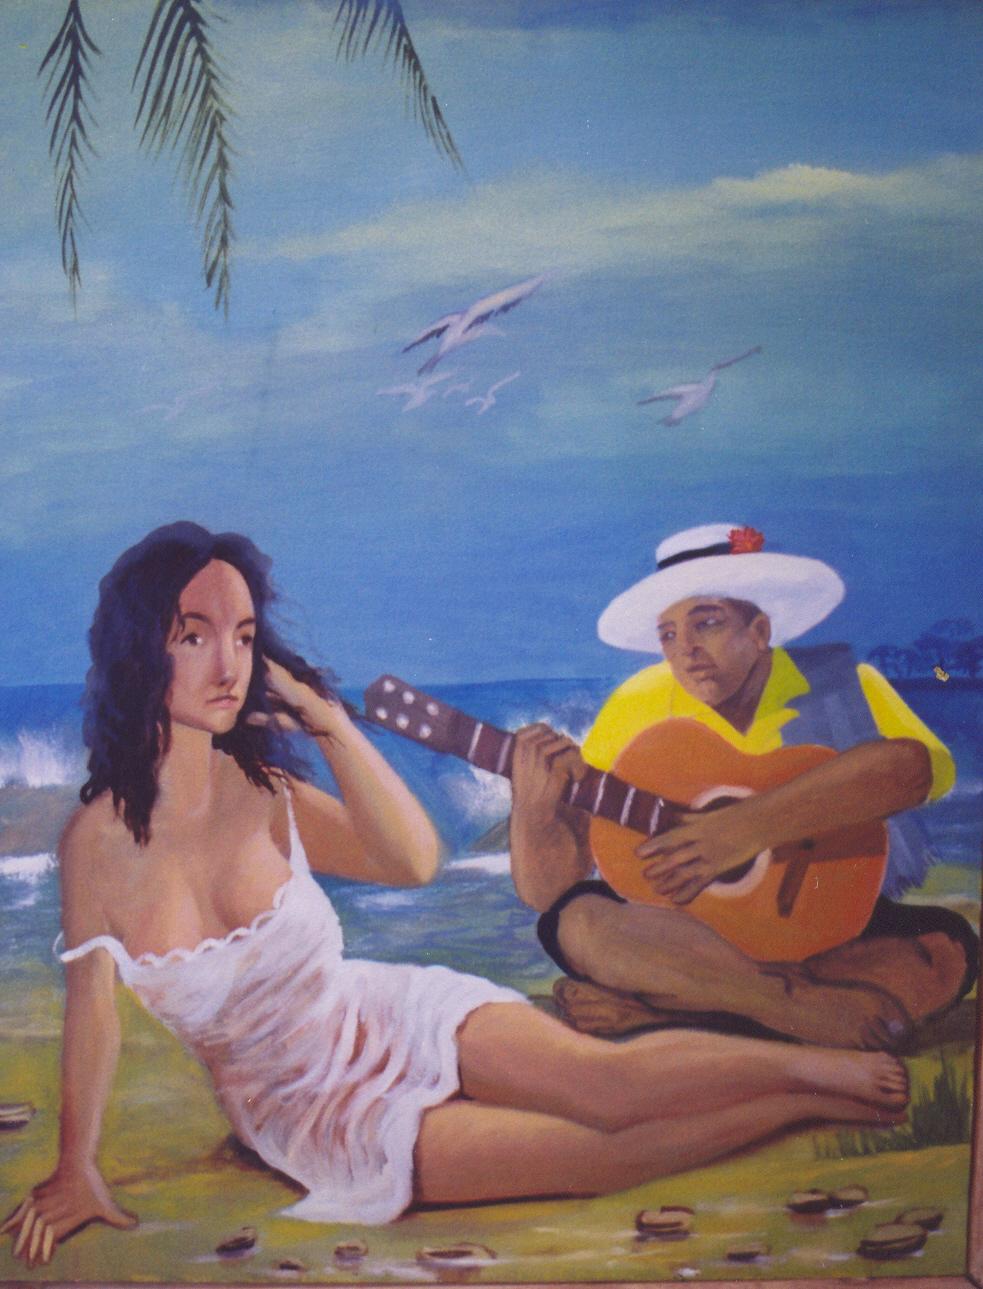 La Sirena, 2007